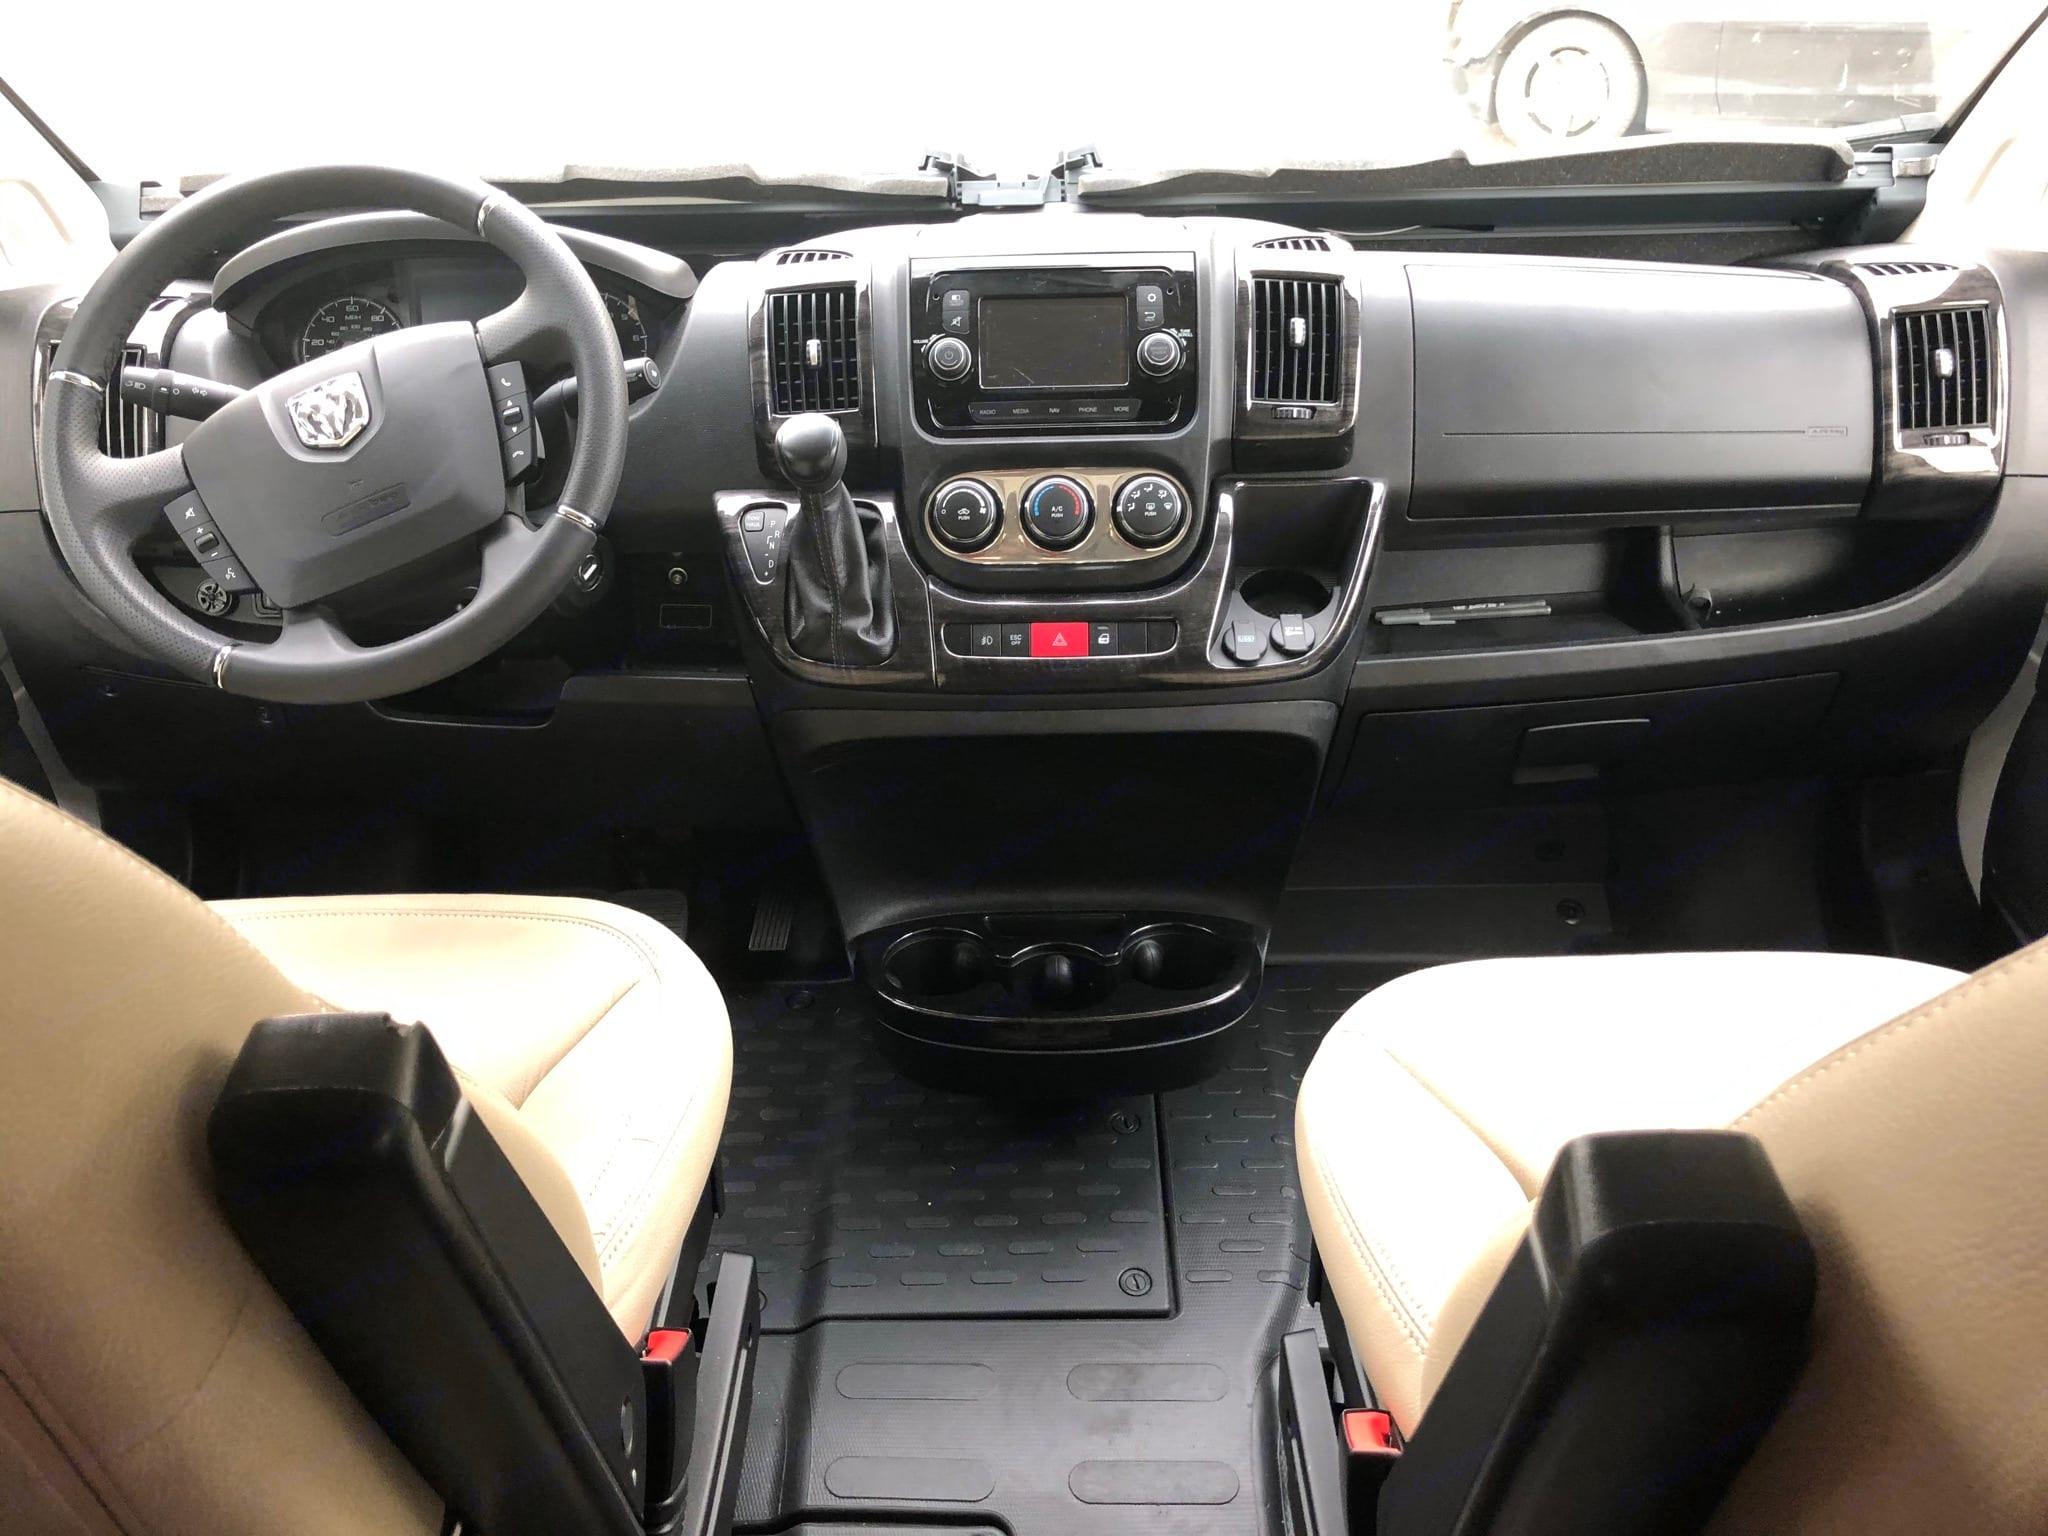 Overhead storage above driver and passenger seats. Winnebago Travato 2020